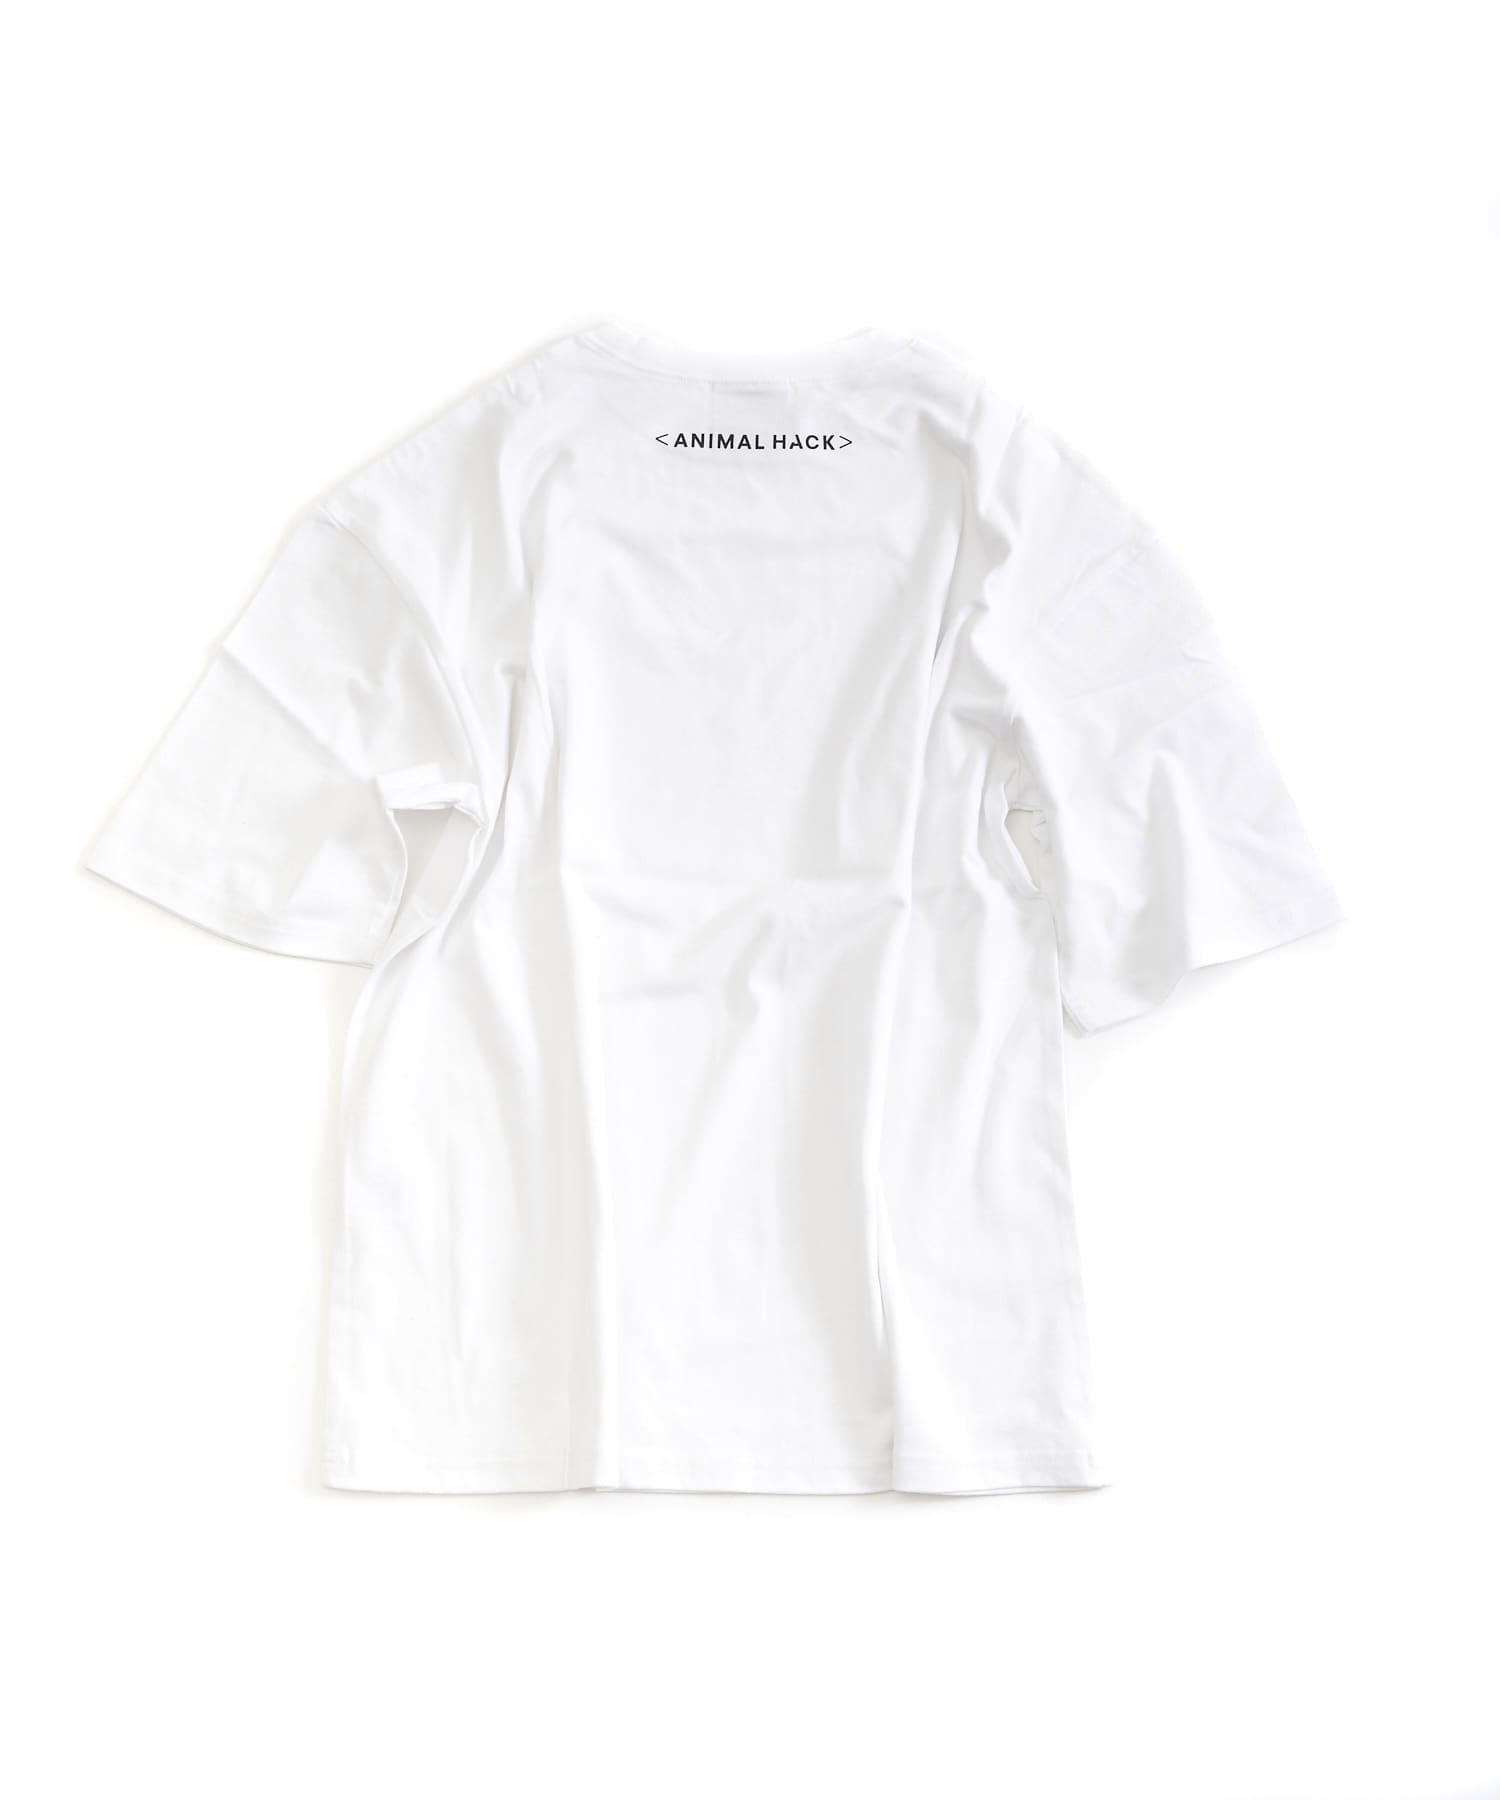 3COINS(スリーコインズ) 【JUKEBOX PROJECT】AWATシャツ